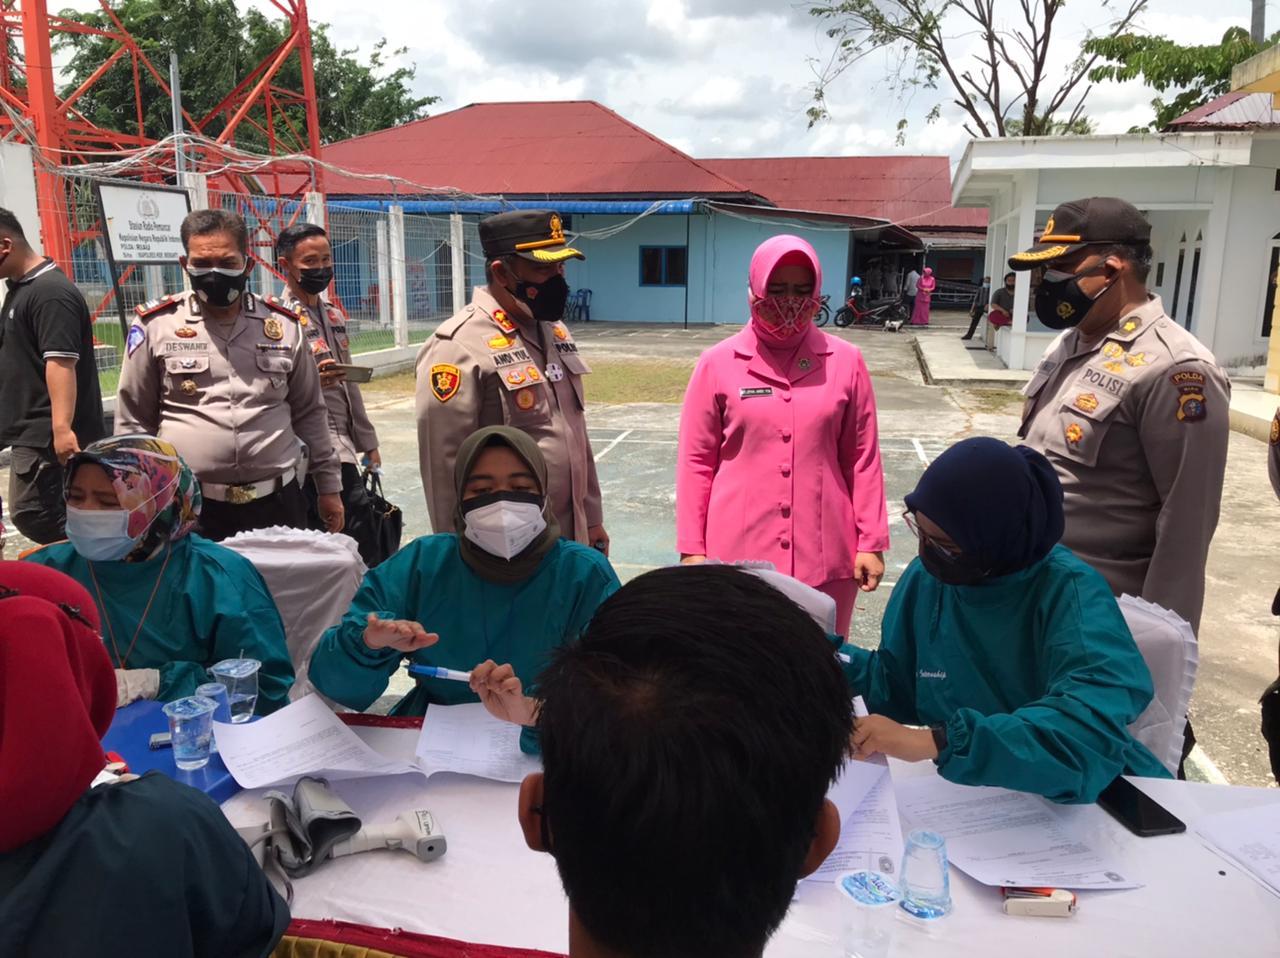 Foto Kapolres Kepulauan Meranti AKBP Andi Yul L.T.G SH., SIK., MH, saat meninjau langsung pelaksanaan vaksinasi.